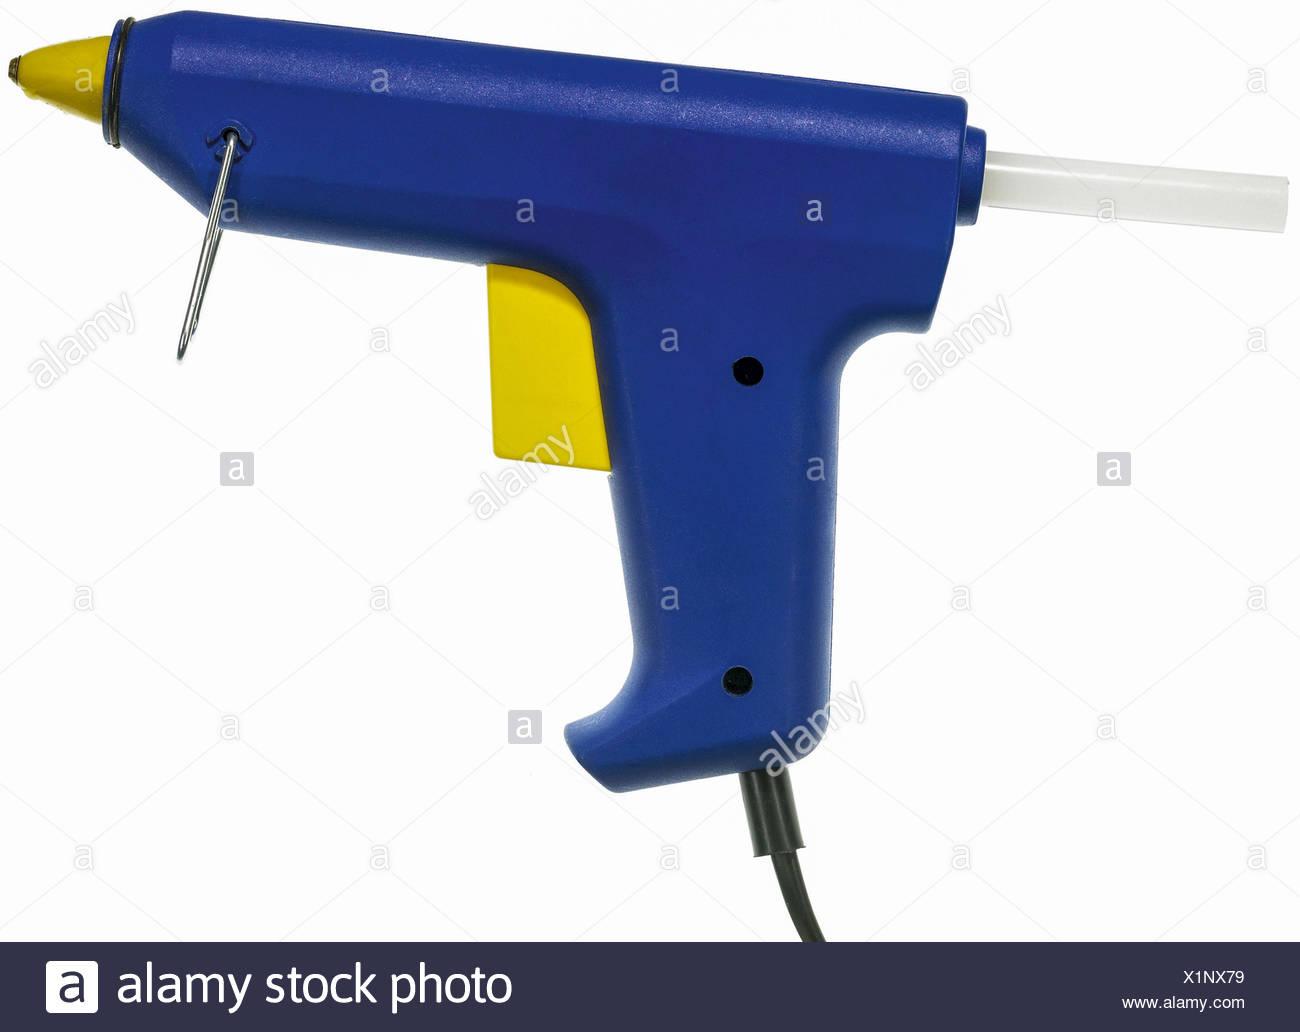 heißklebepistole stock photos & heißklebepistole stock images - alamy